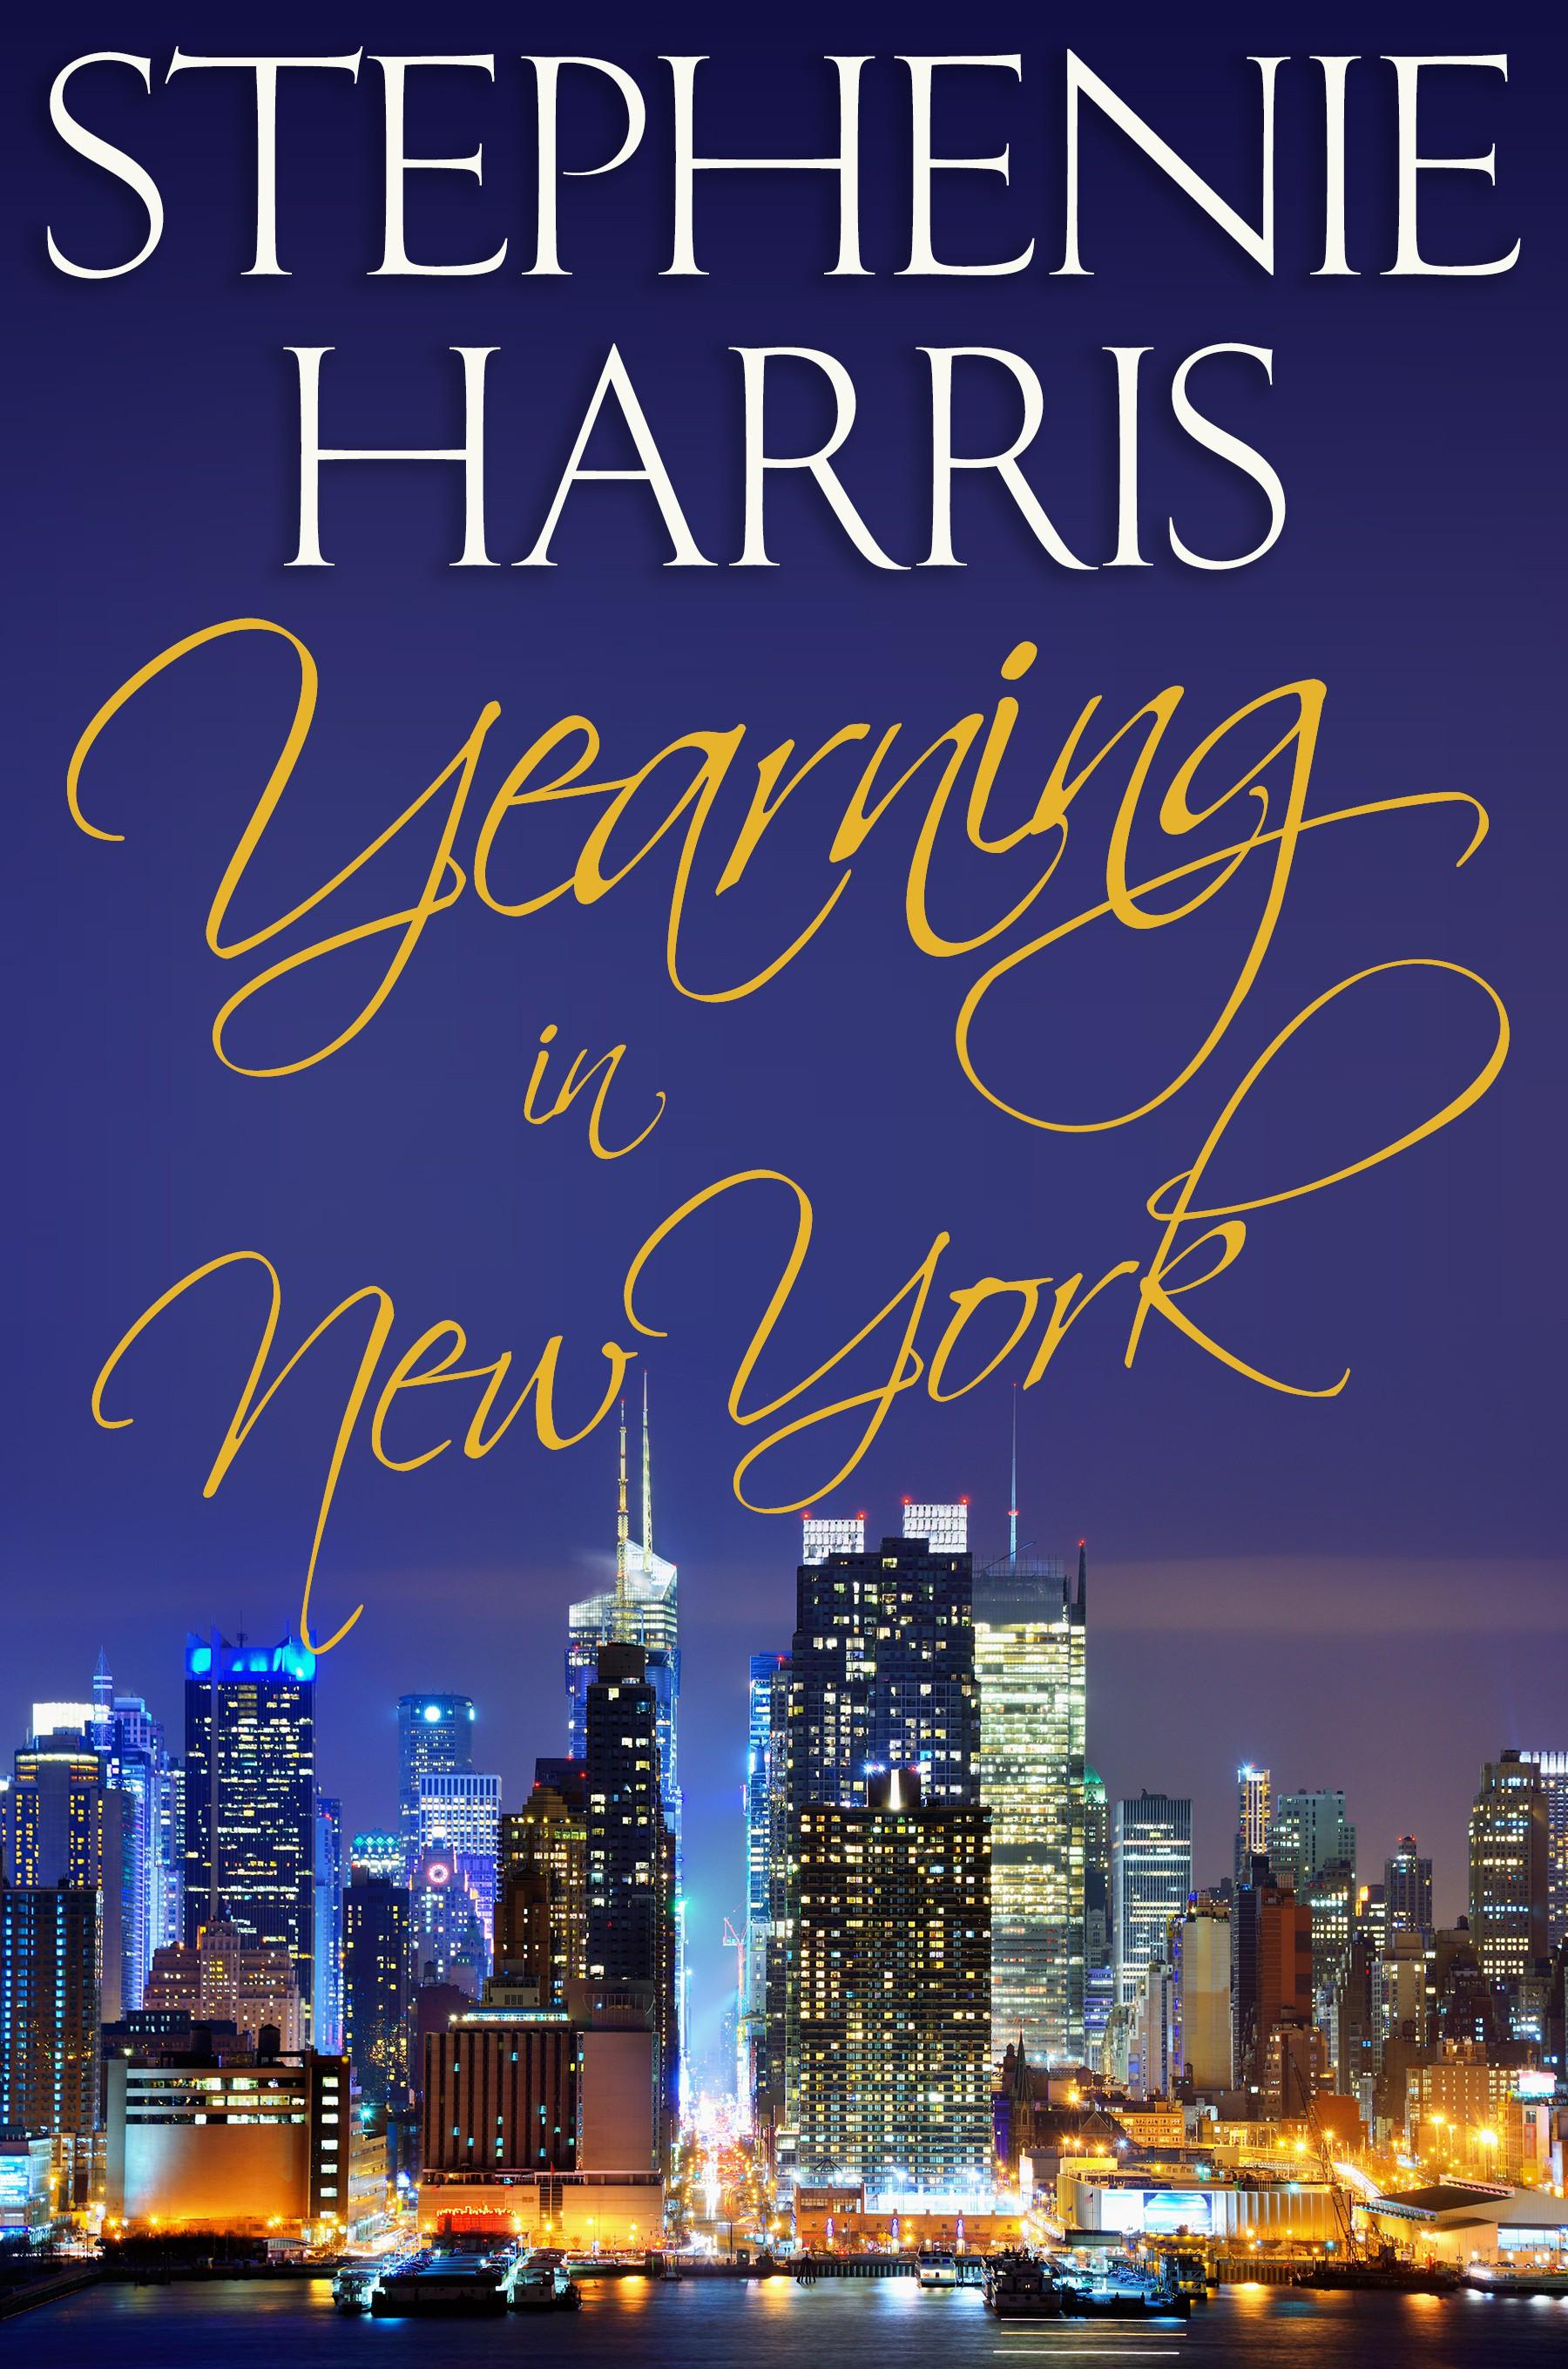 Classy Romance Novel Cover